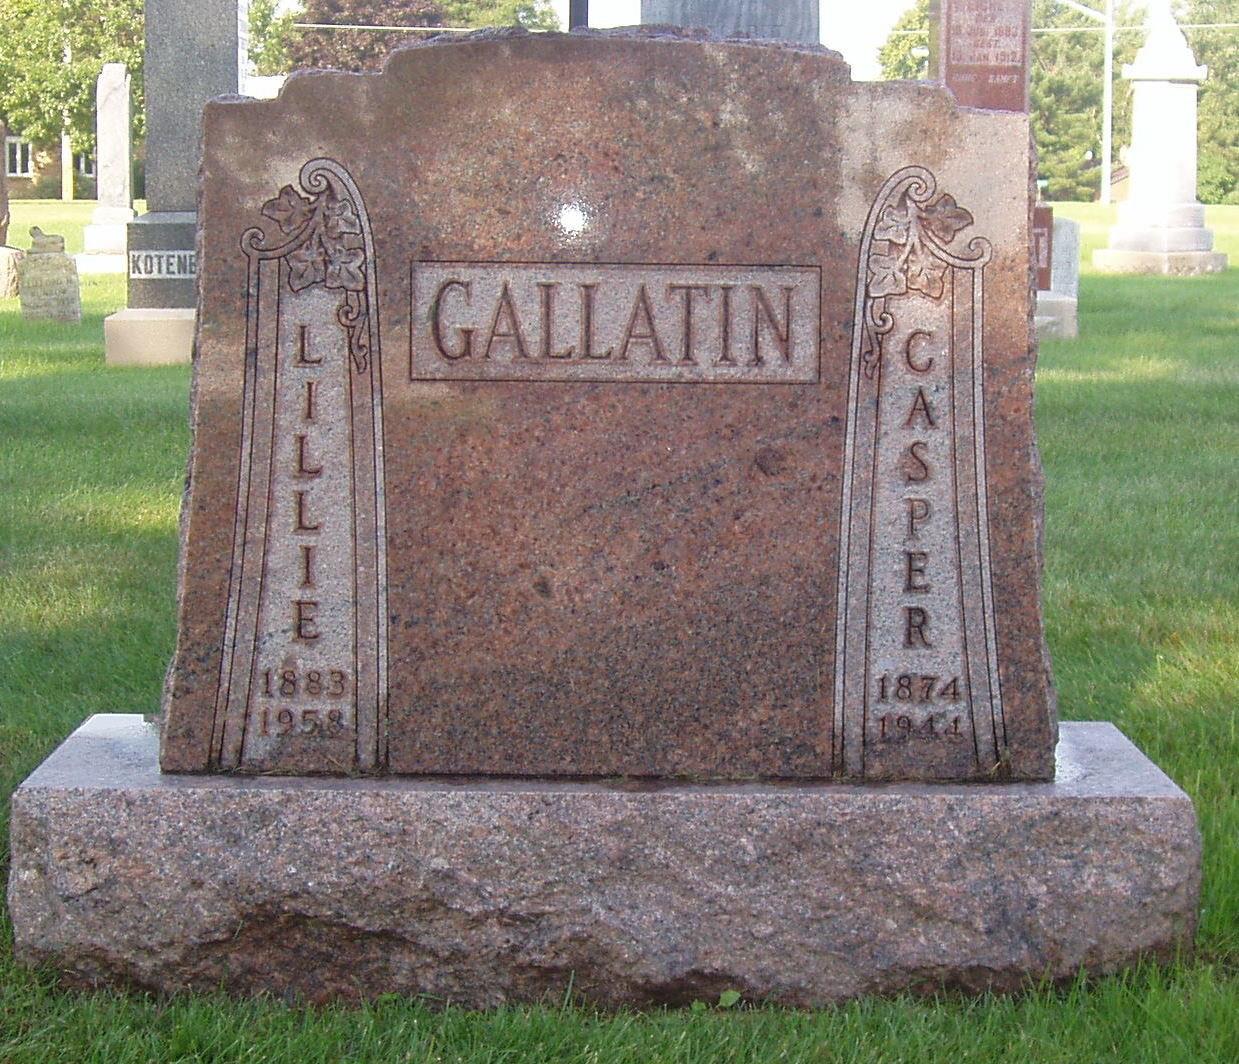 Lillian Gallatin